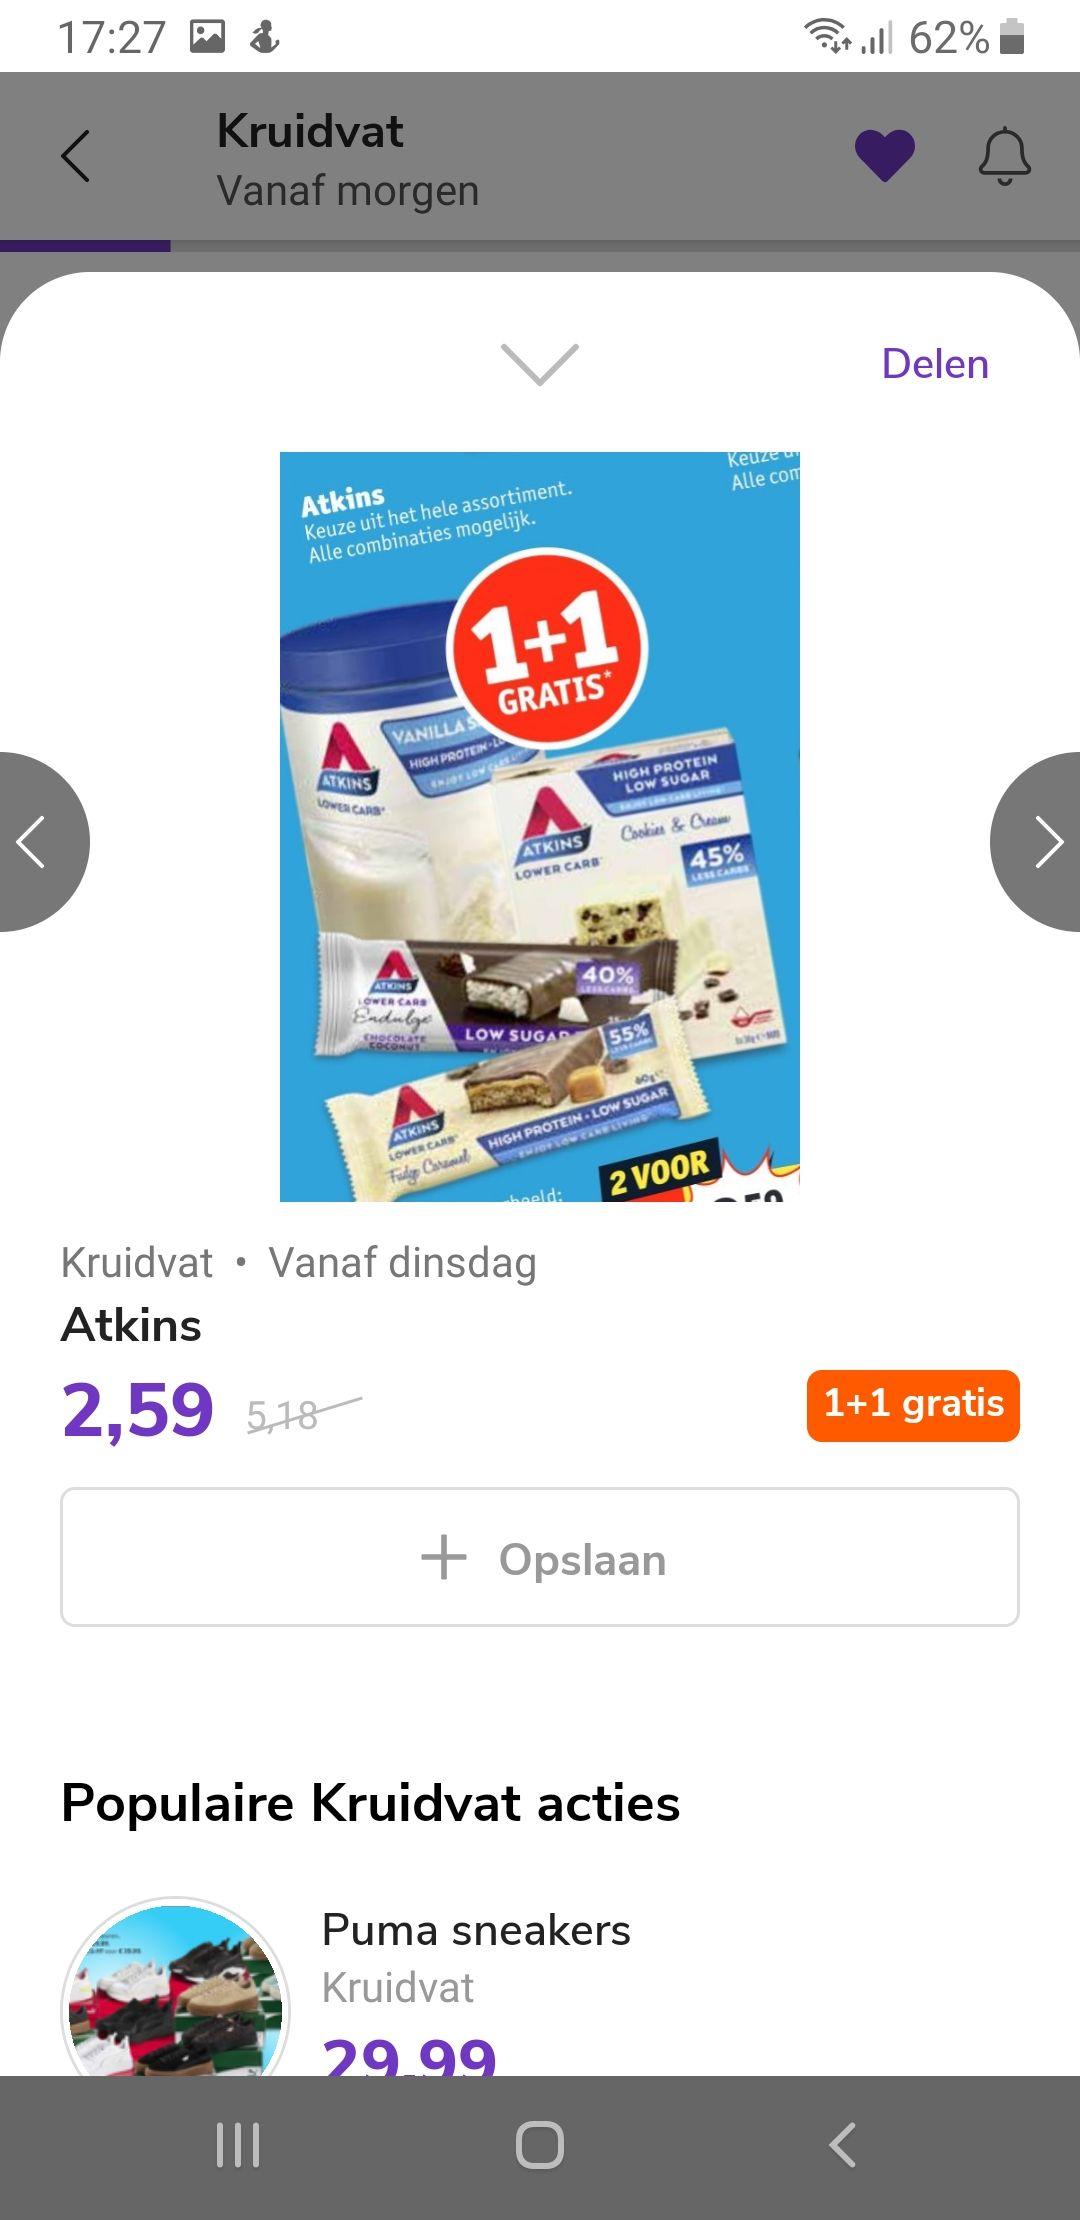 Atkins 1+1 gratis Kruidvat, nu 2 voor 2,59